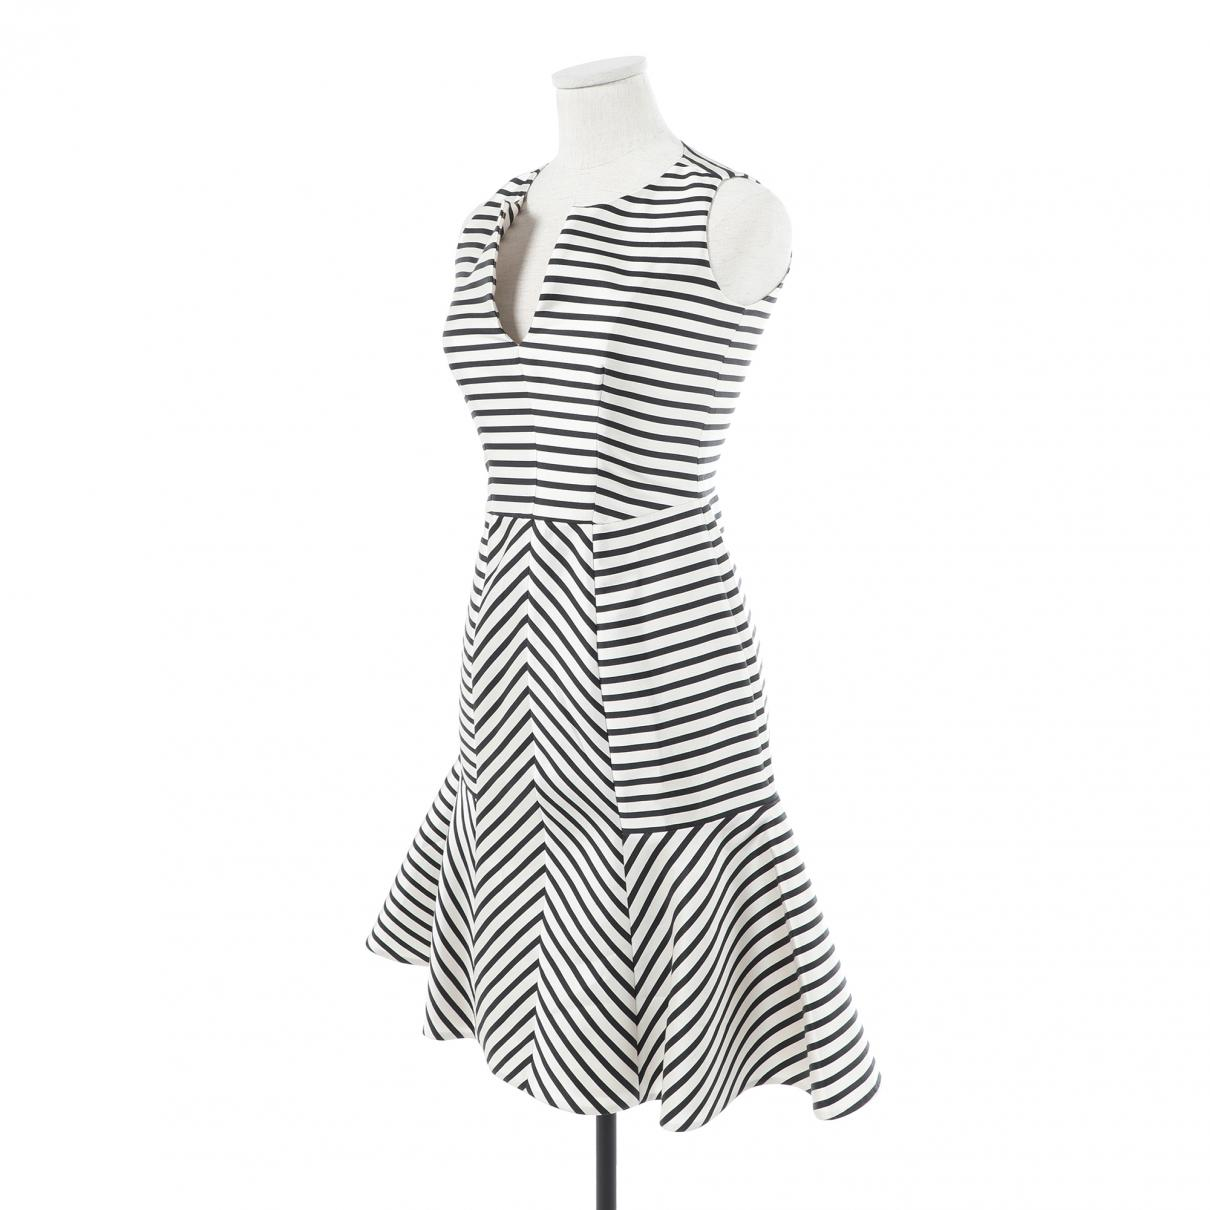 lyst carolina herrera mid length dress in white Armani Evening Gowns view fullscreen